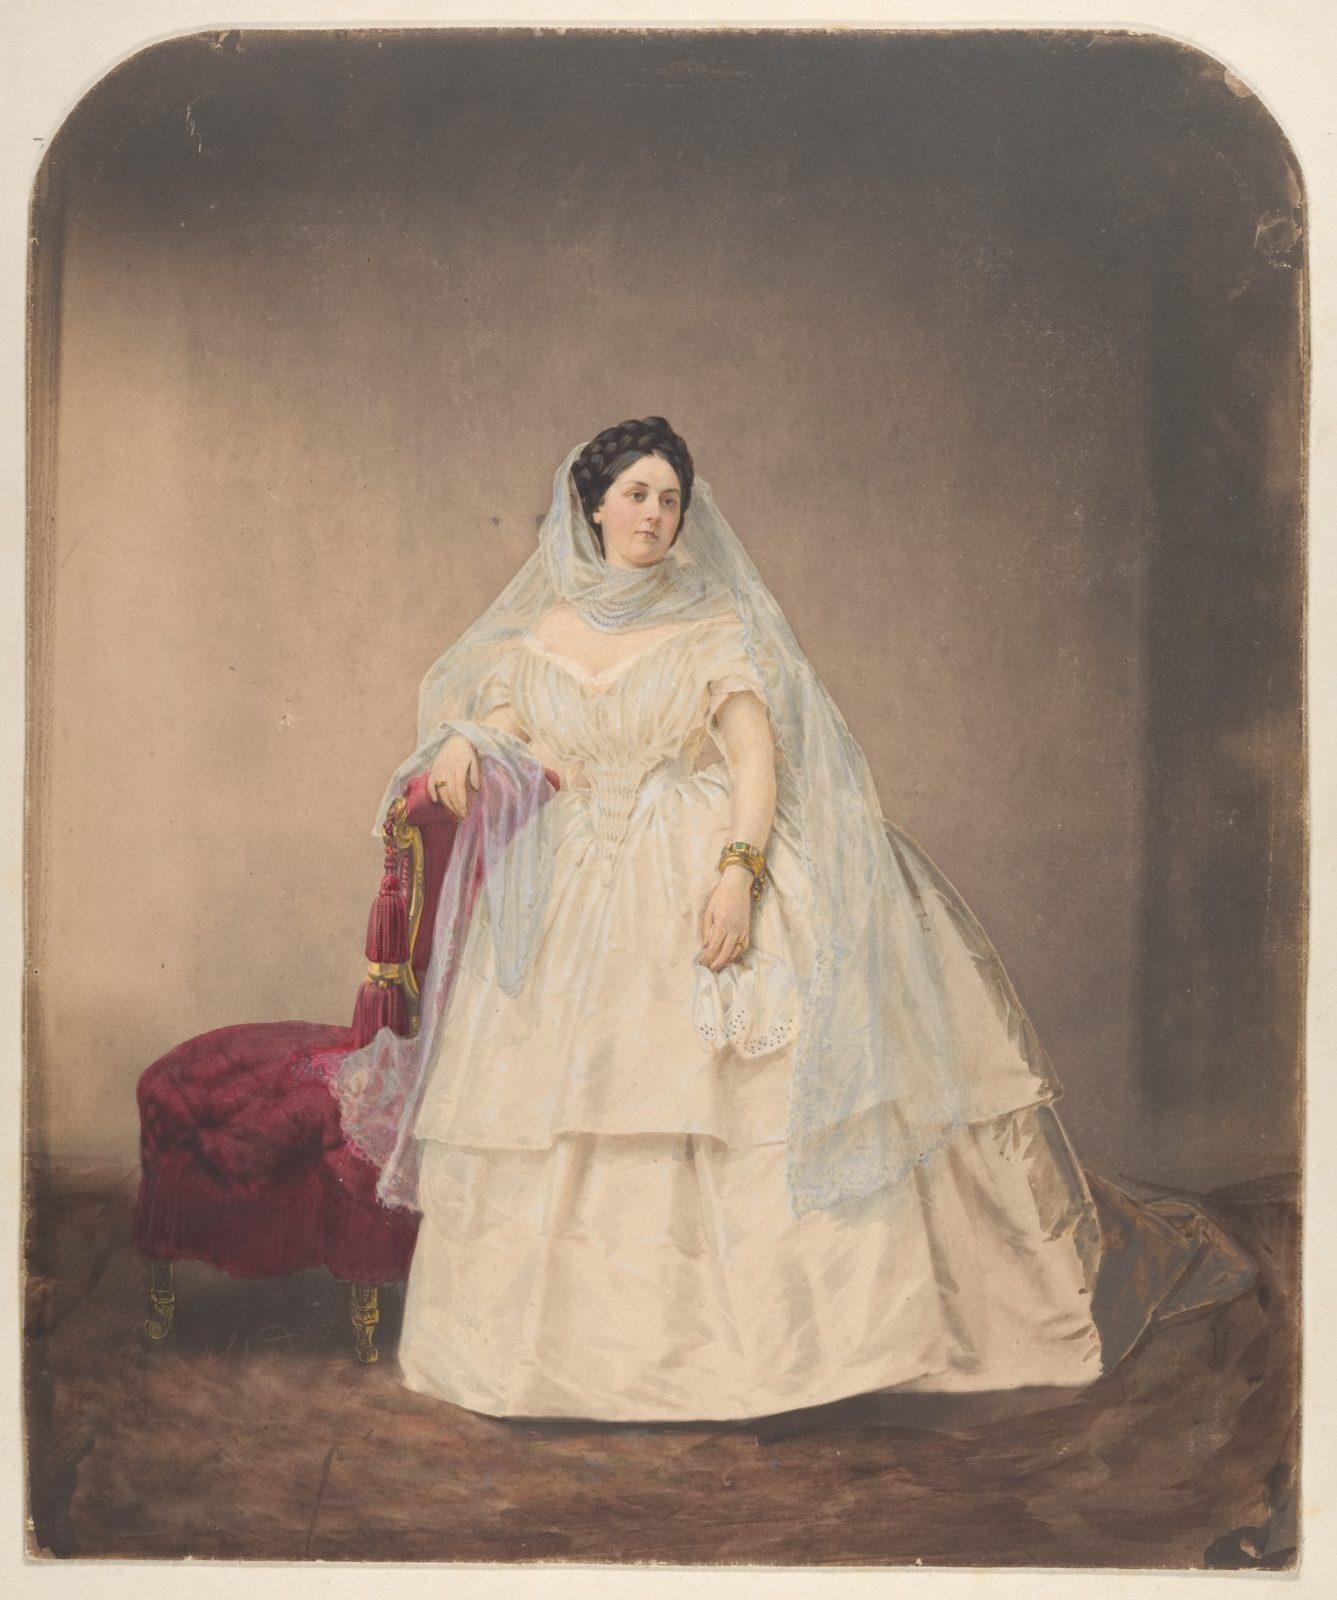 [Portrait in a White Dress]